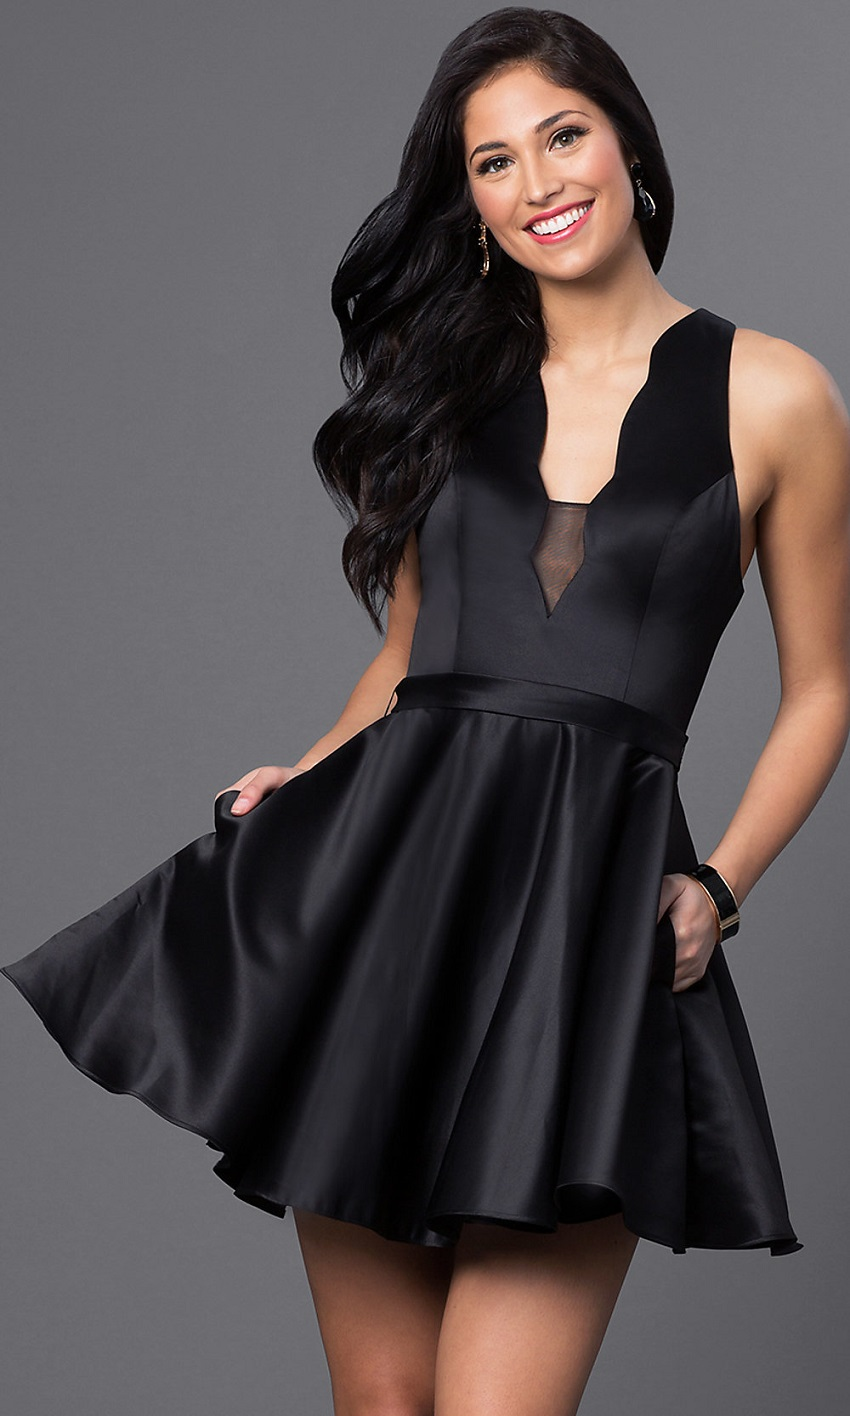 Some short black dresses: class, elegance and good taste!